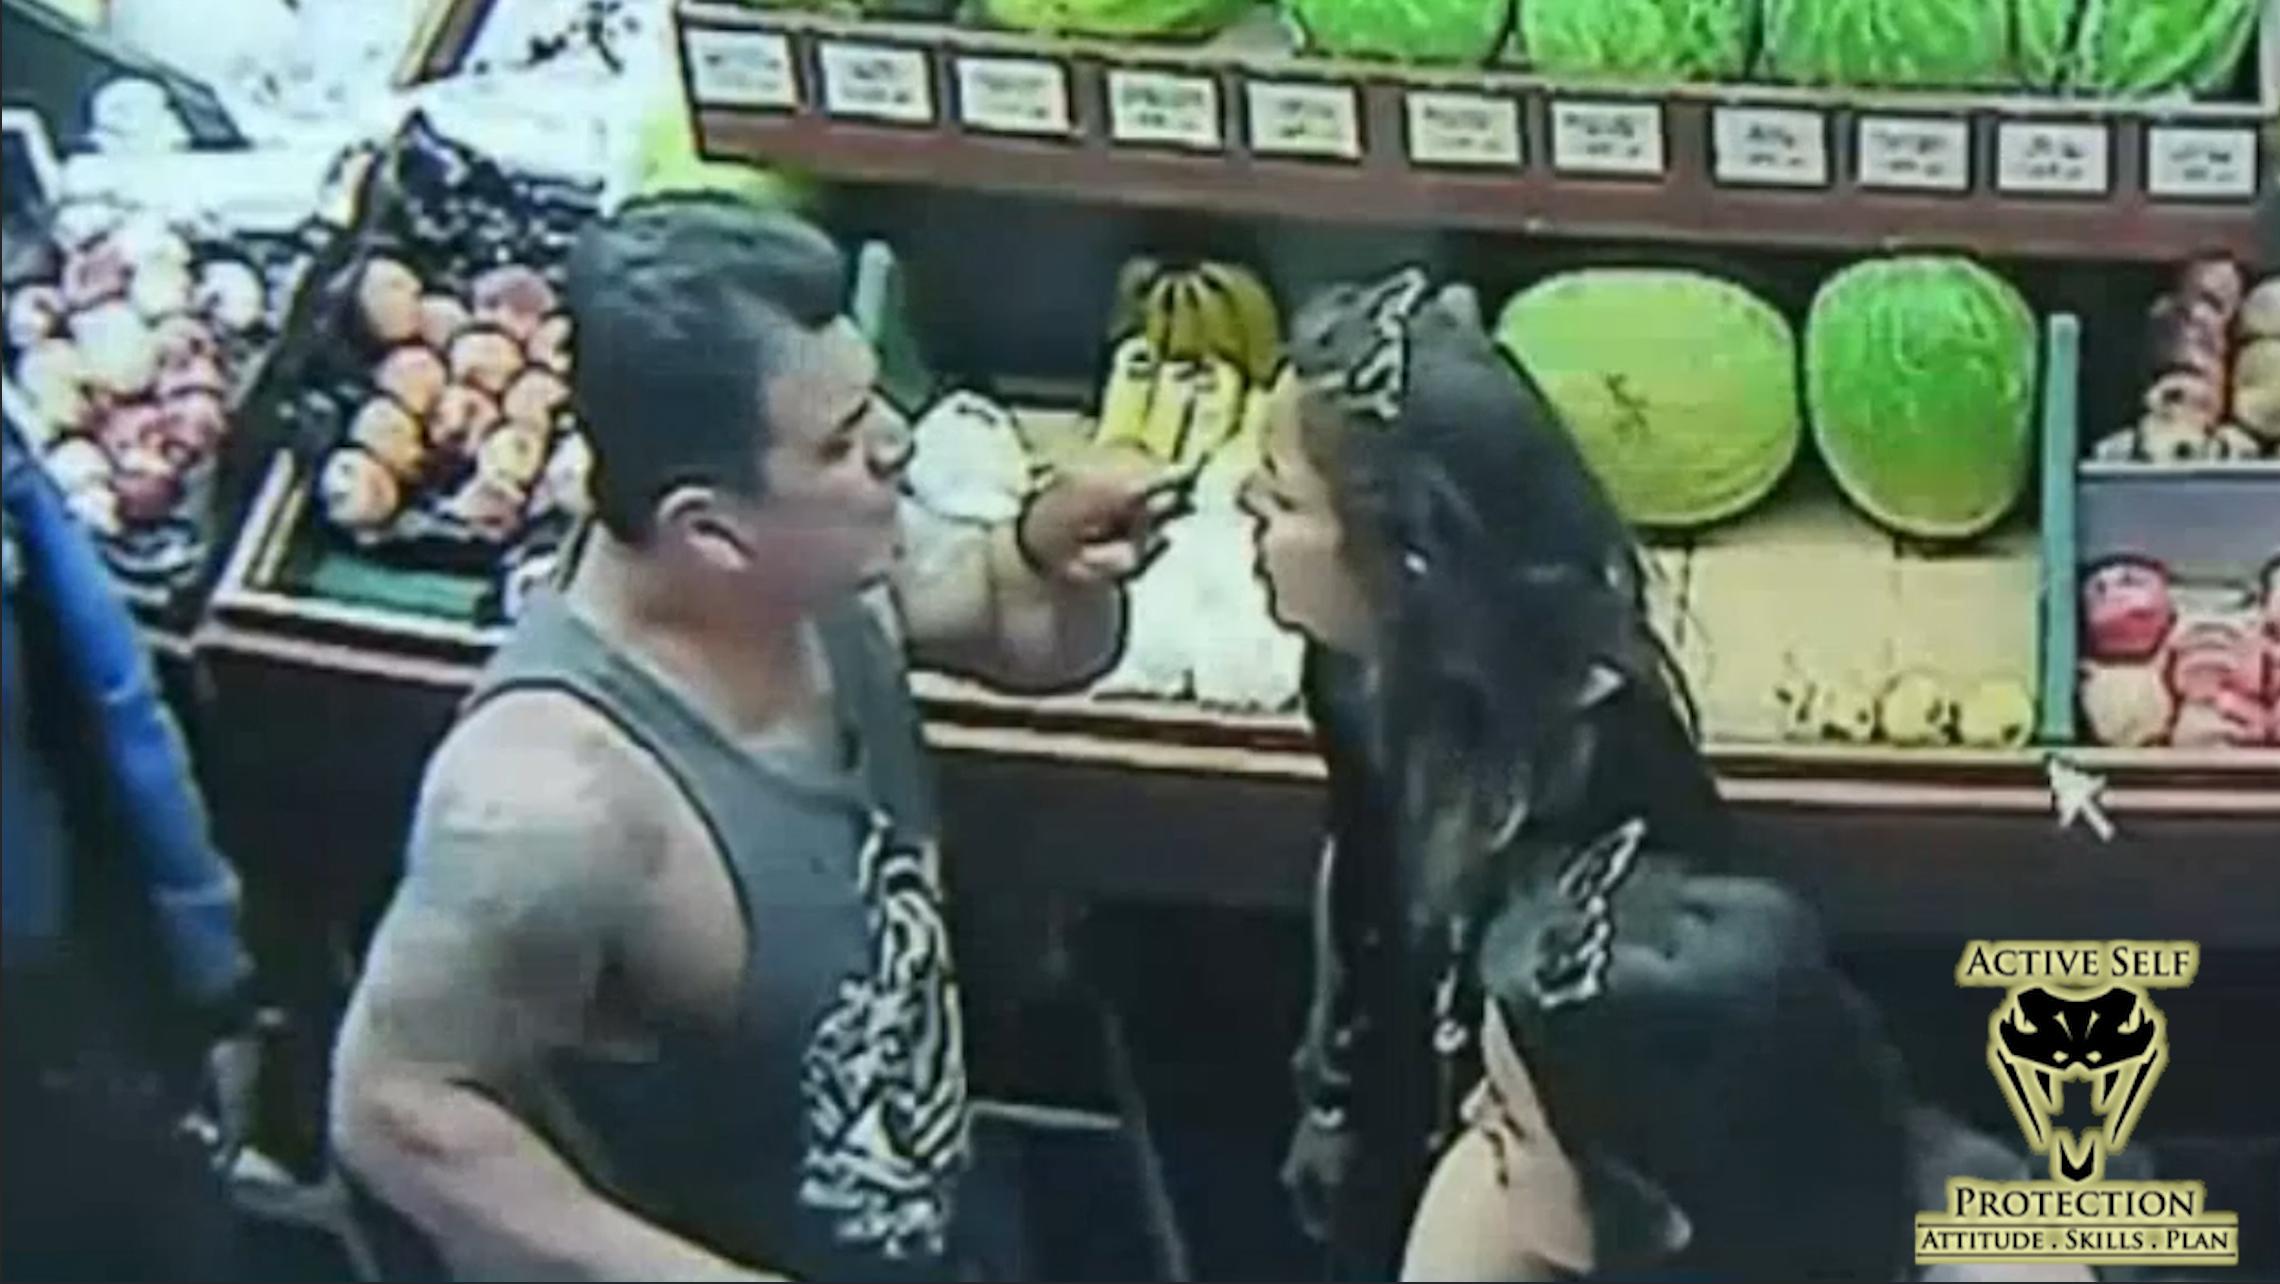 Argument Leads to Sucker Punch